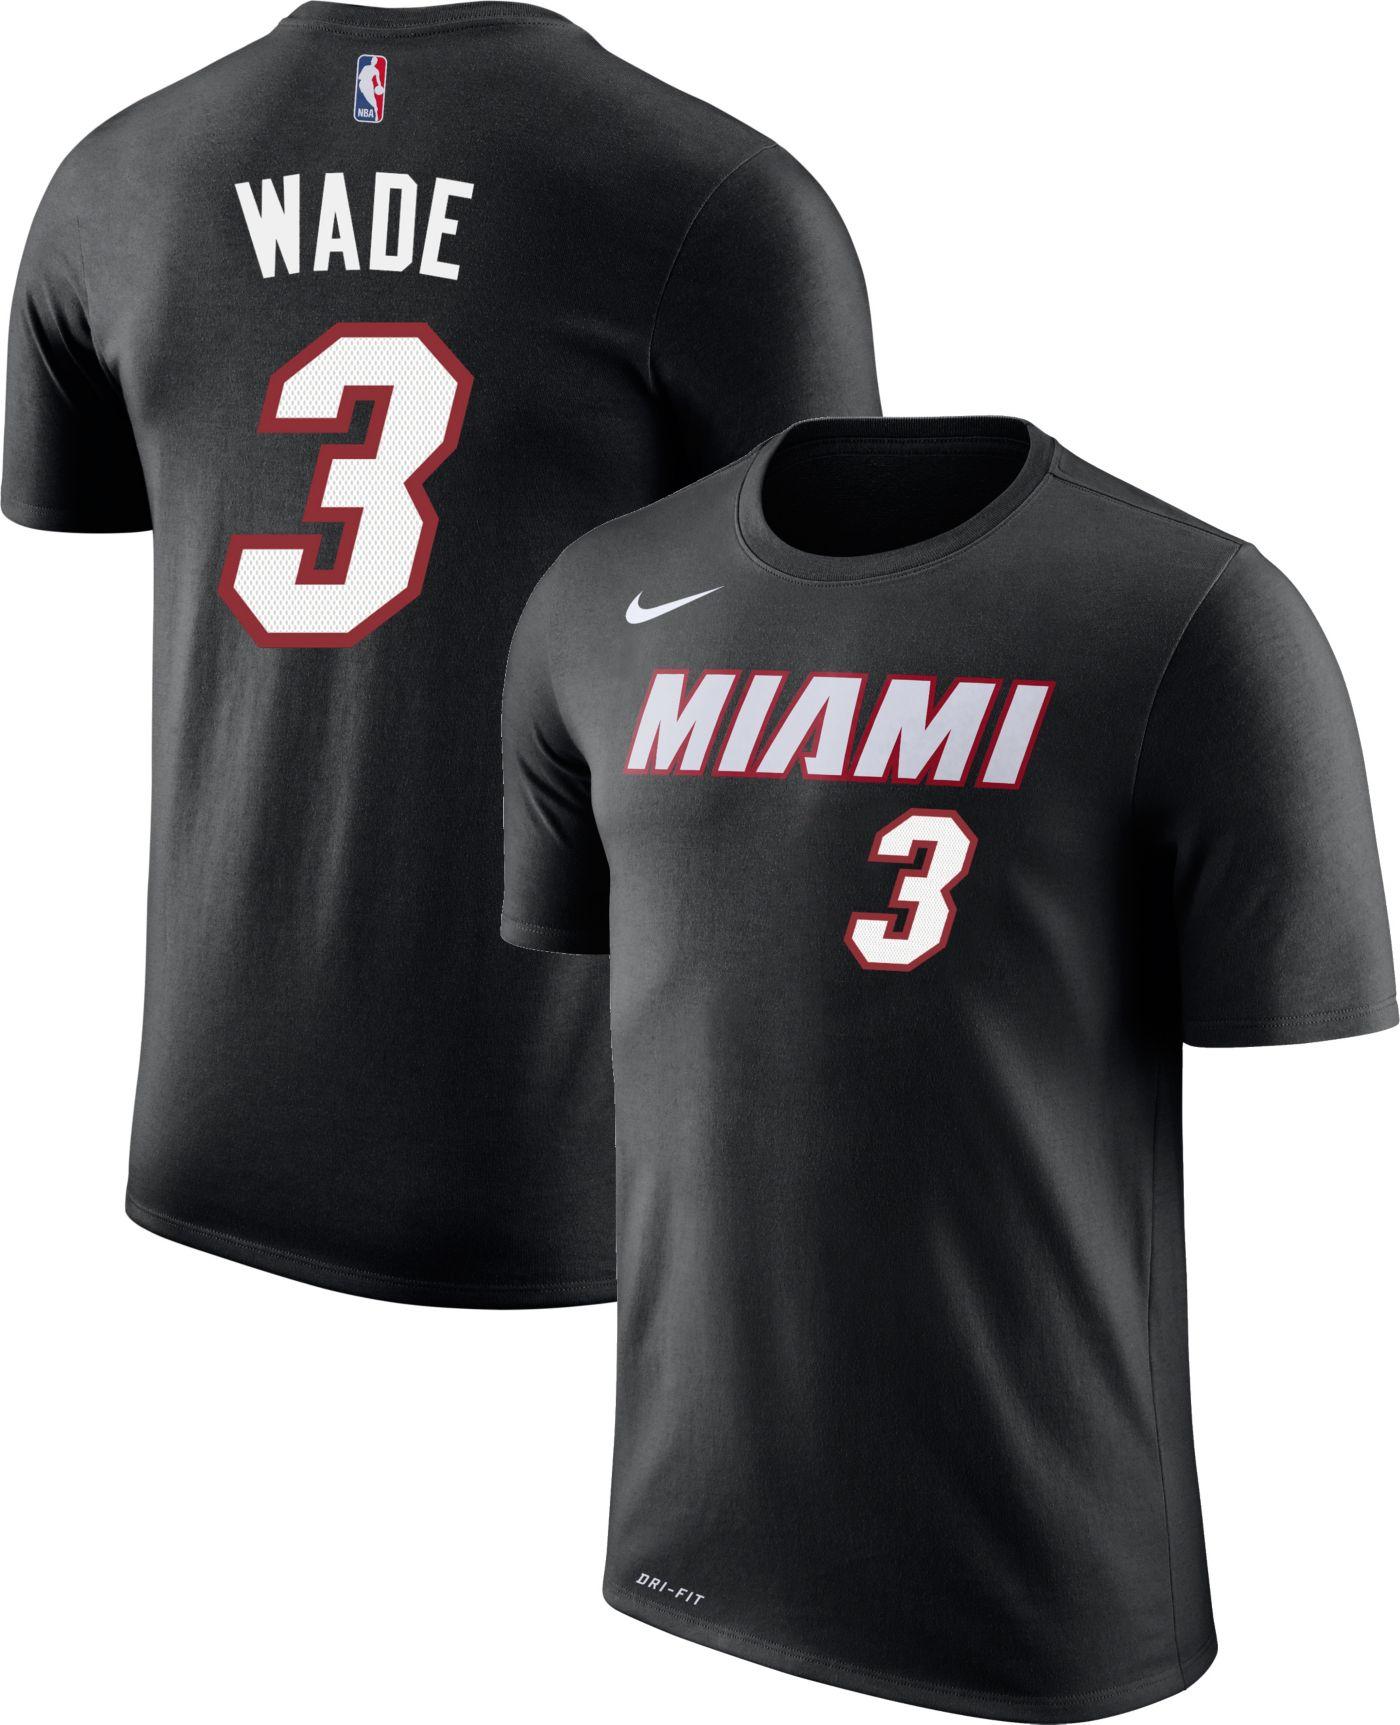 Nike Youth Miami Heat Dwyane Wade #3 Dri-FIT Black T-Shirt